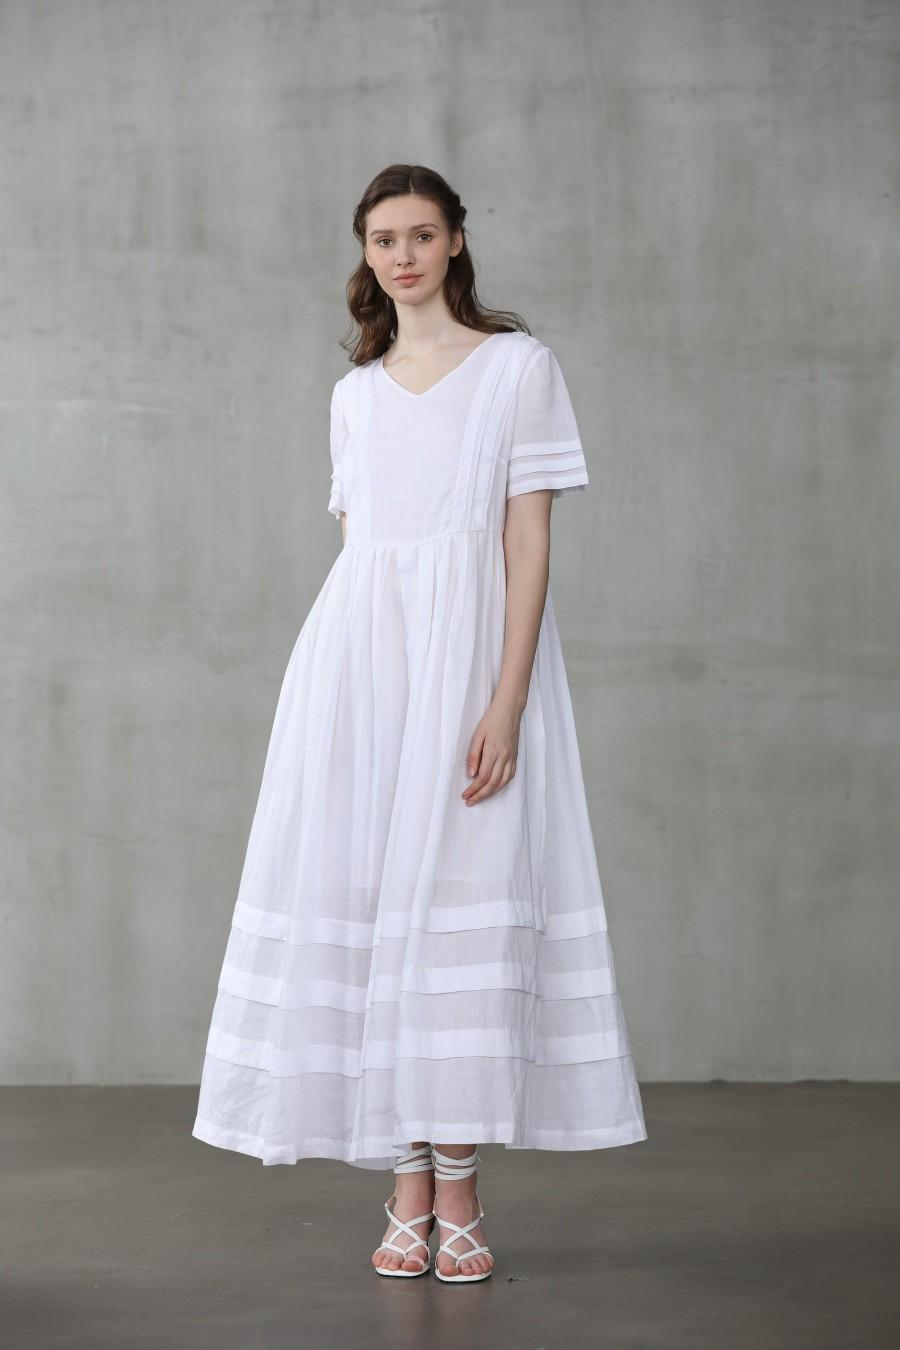 Mariage - white dress, linen dress, wedding dress, maxi dress, sailor dress, bridal dress, plus size dressfull dress, kaftan dress